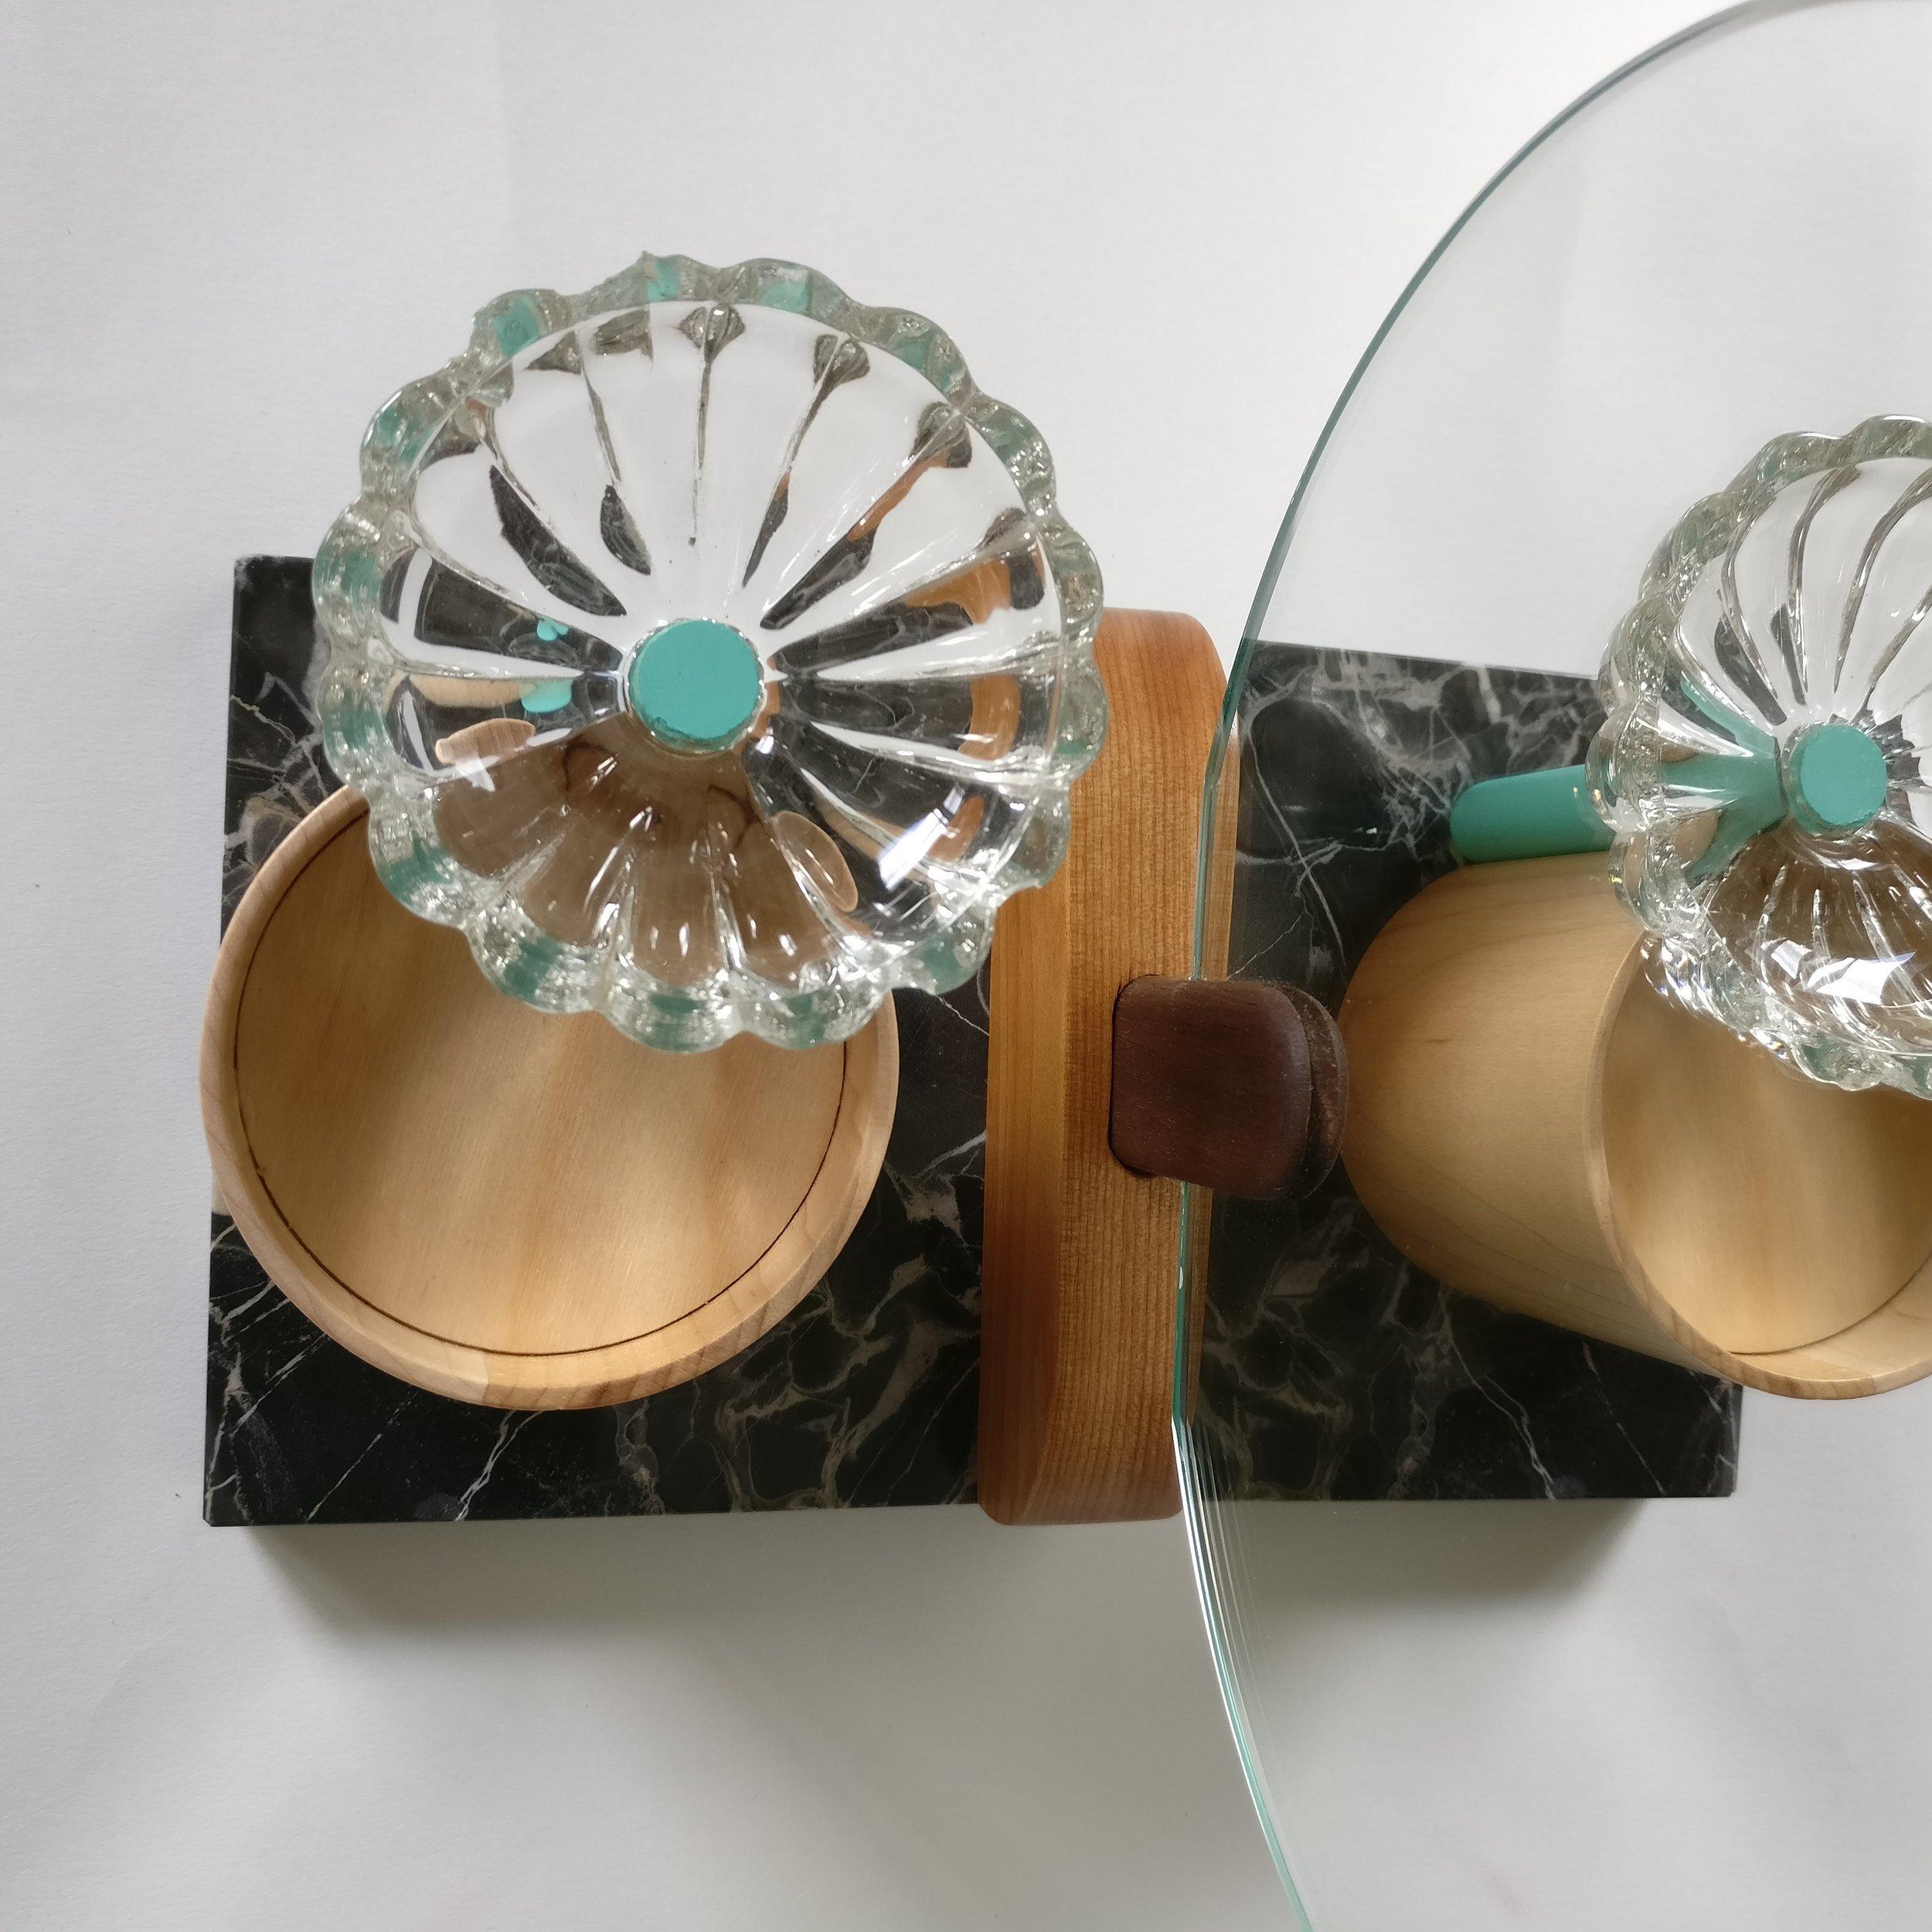 Jewelrt box, totem, wood, design, projet eight eight, projet huit huit, Myriam Rigaud, designer, memphis, geometric, Vanity green